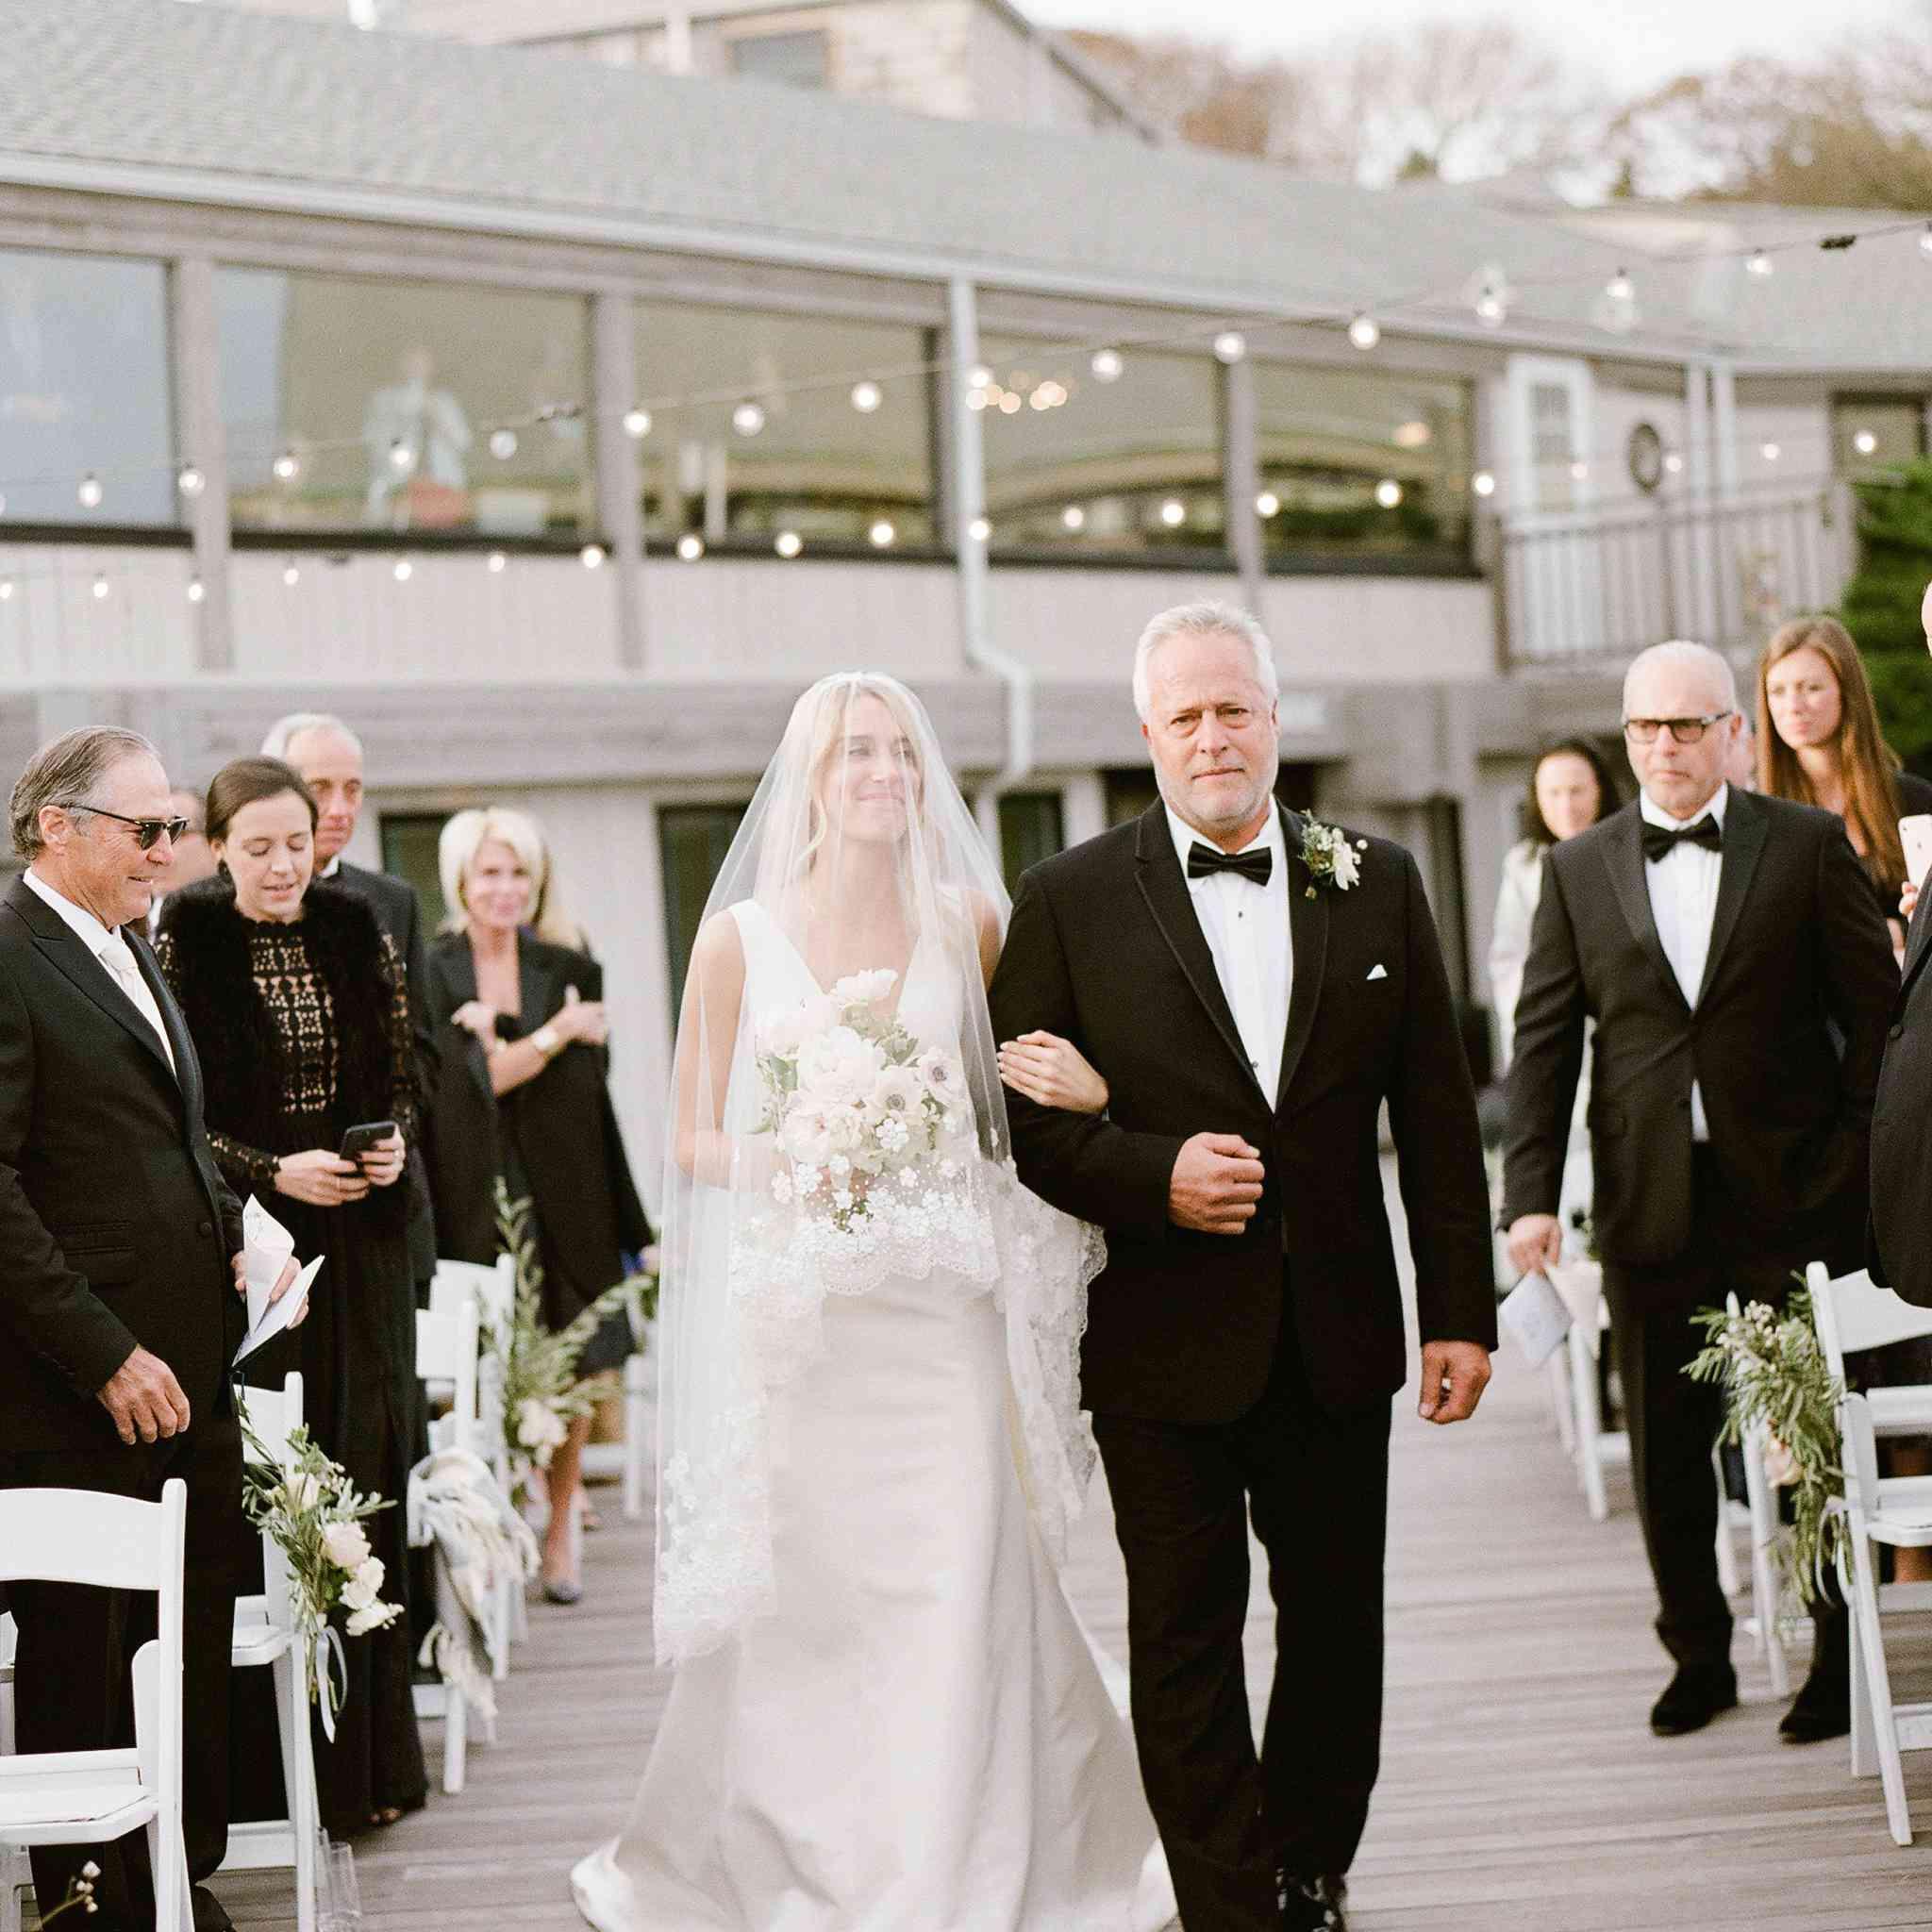 <p>father walking bride down aisle</p><br><br>